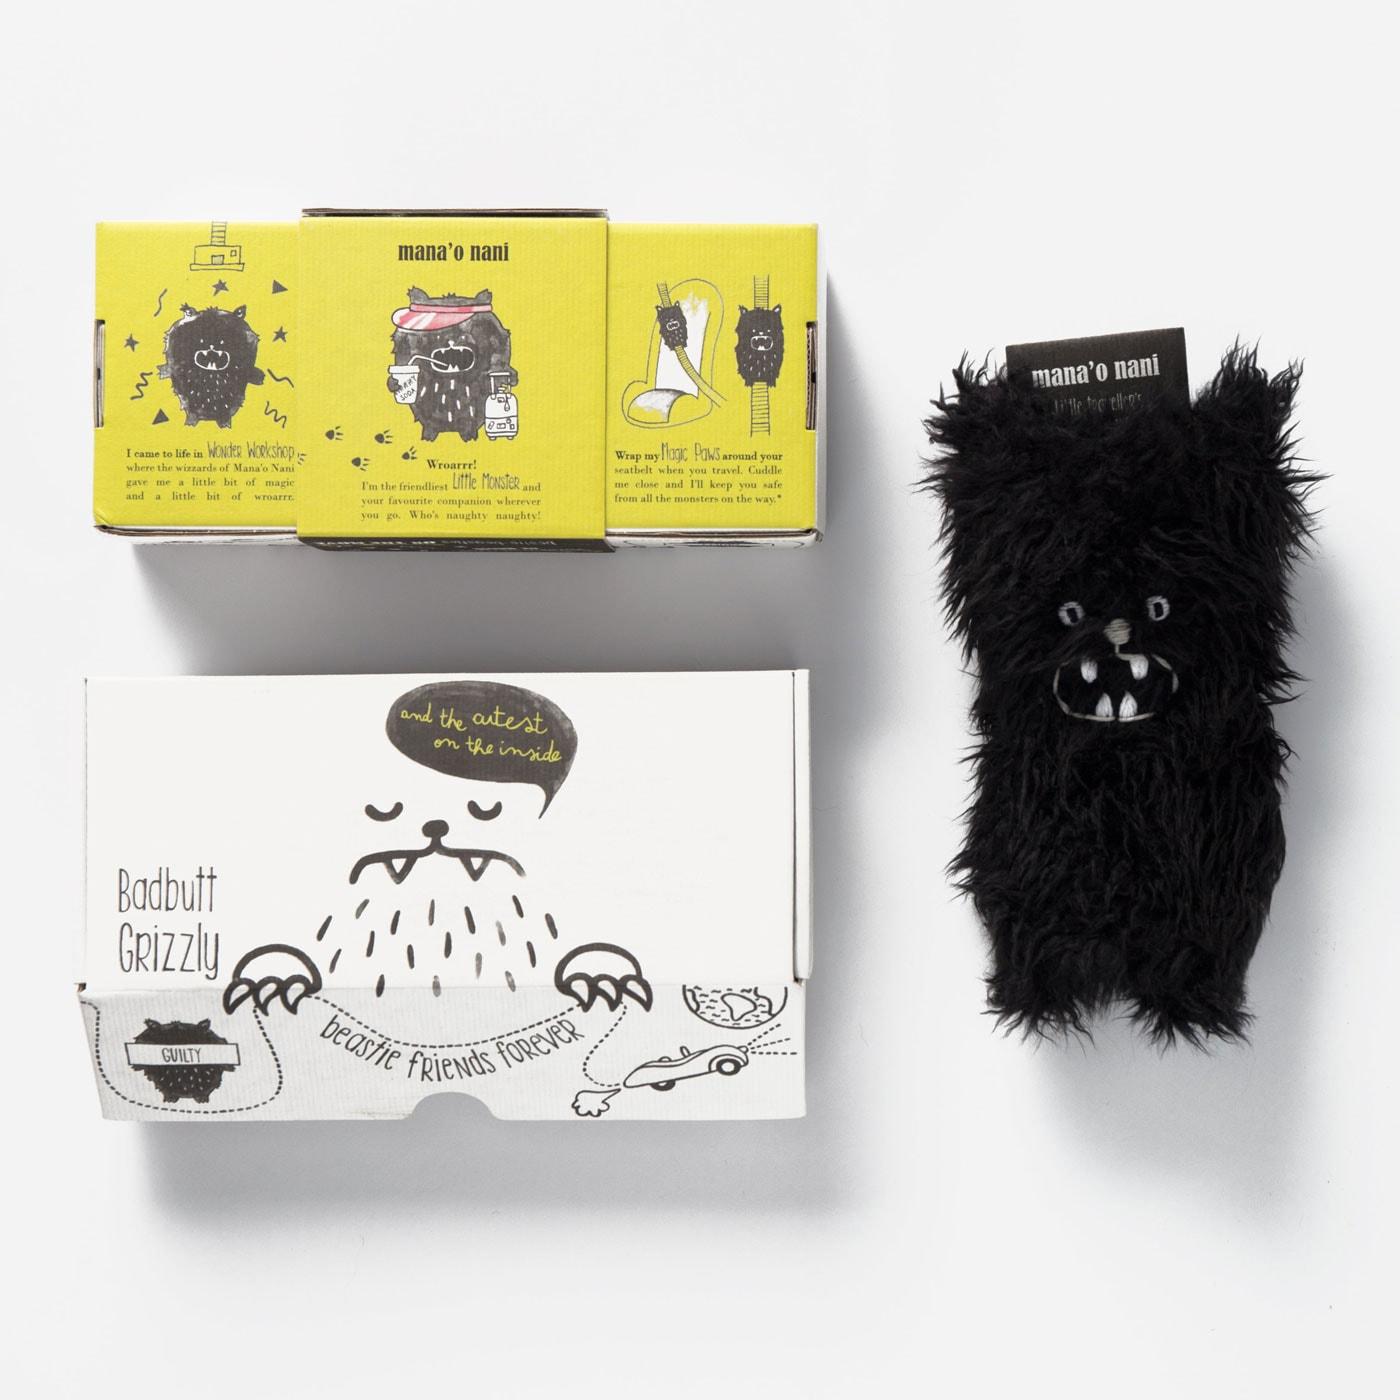 Lieblingssachen für Kinder: Magnet-Tier // HIMBEER